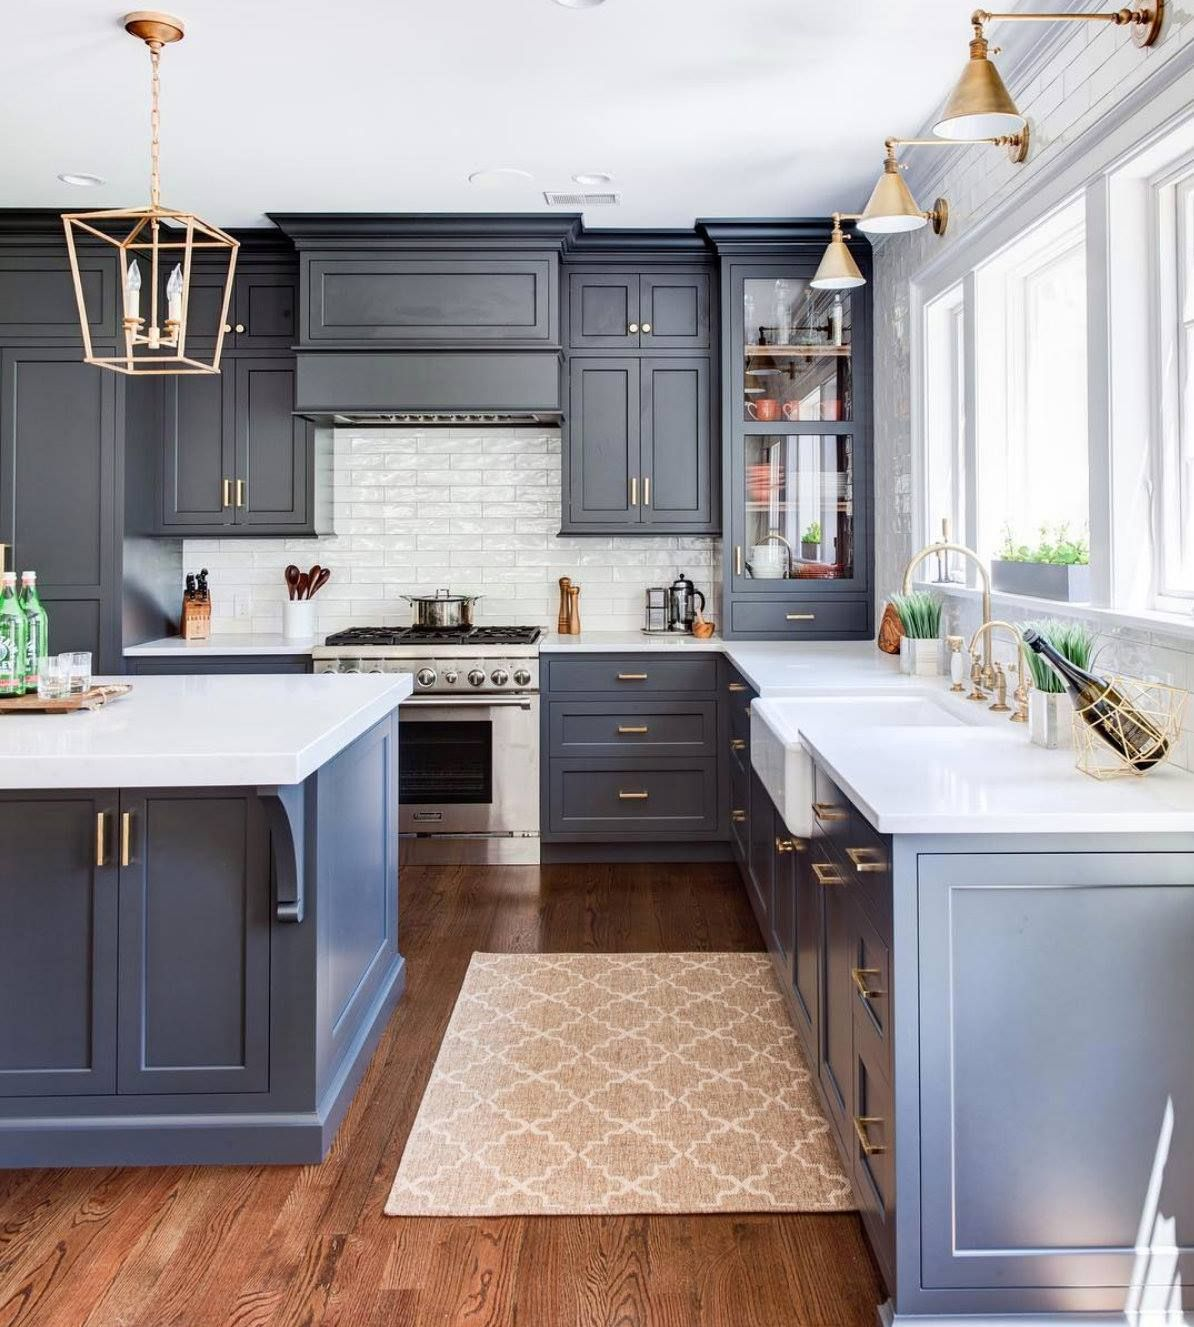 2019 Long Lifetime Wooden Color Membrane Pvc Kitchen Cabinet For Standard  Kitchen Furniture - Buy Kitchen Cabinet,Tainless Steel Kitchen ...